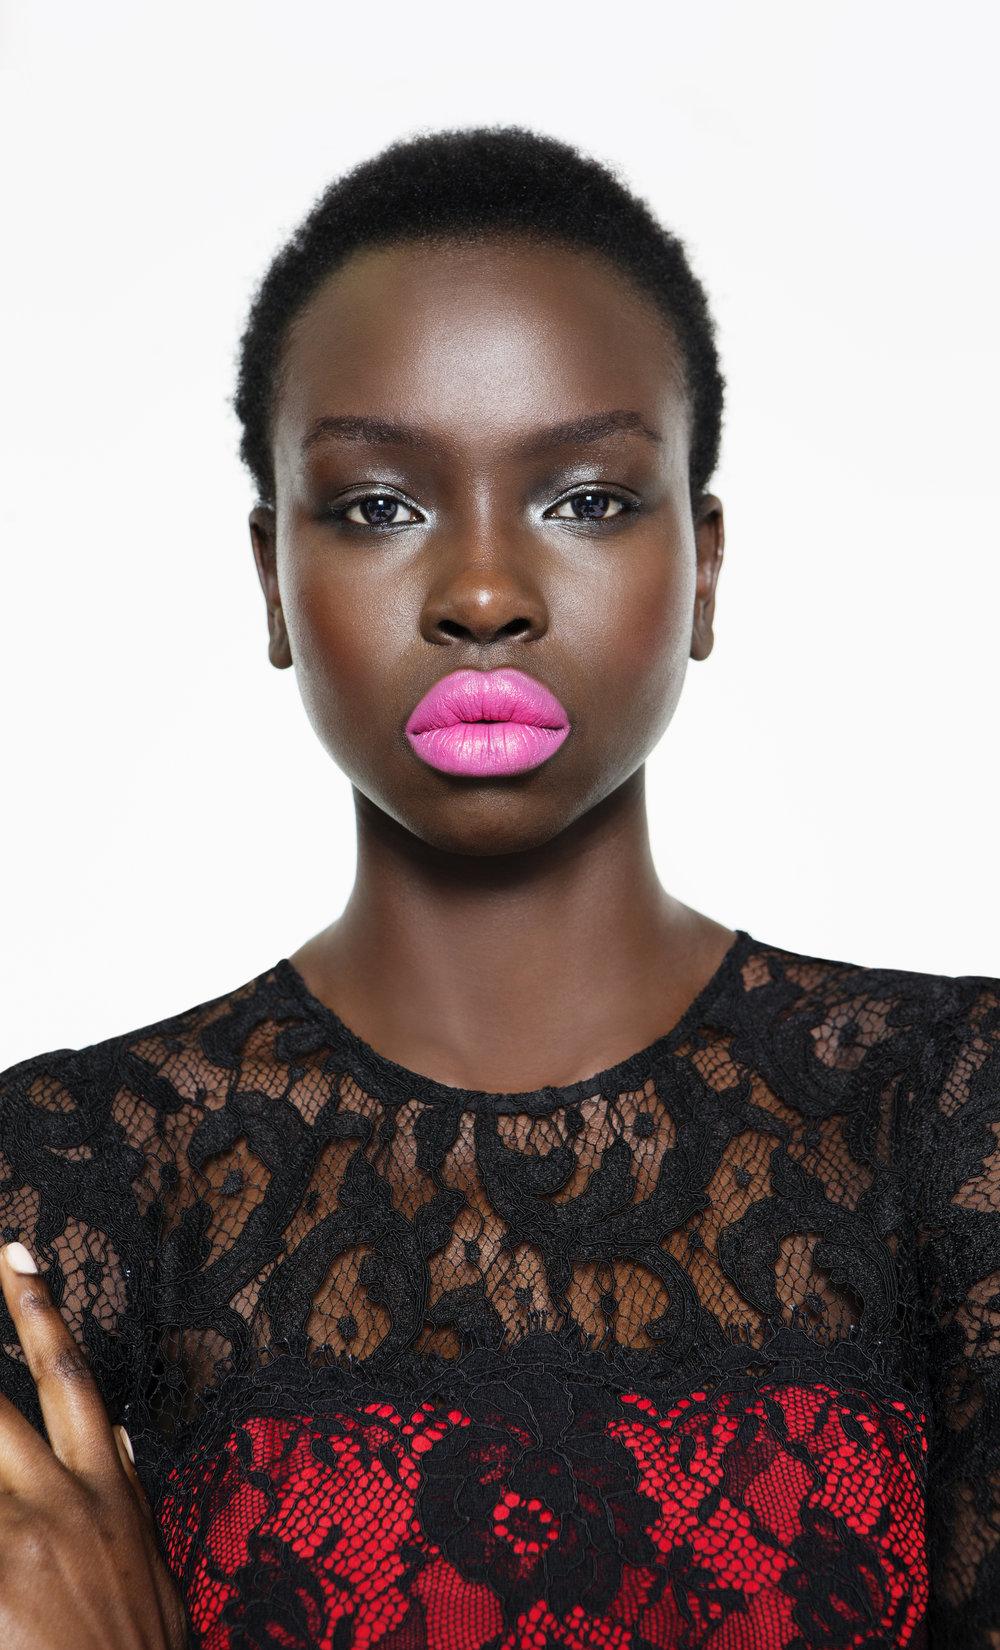 Yaya_Pink_Lips_ext.jpg